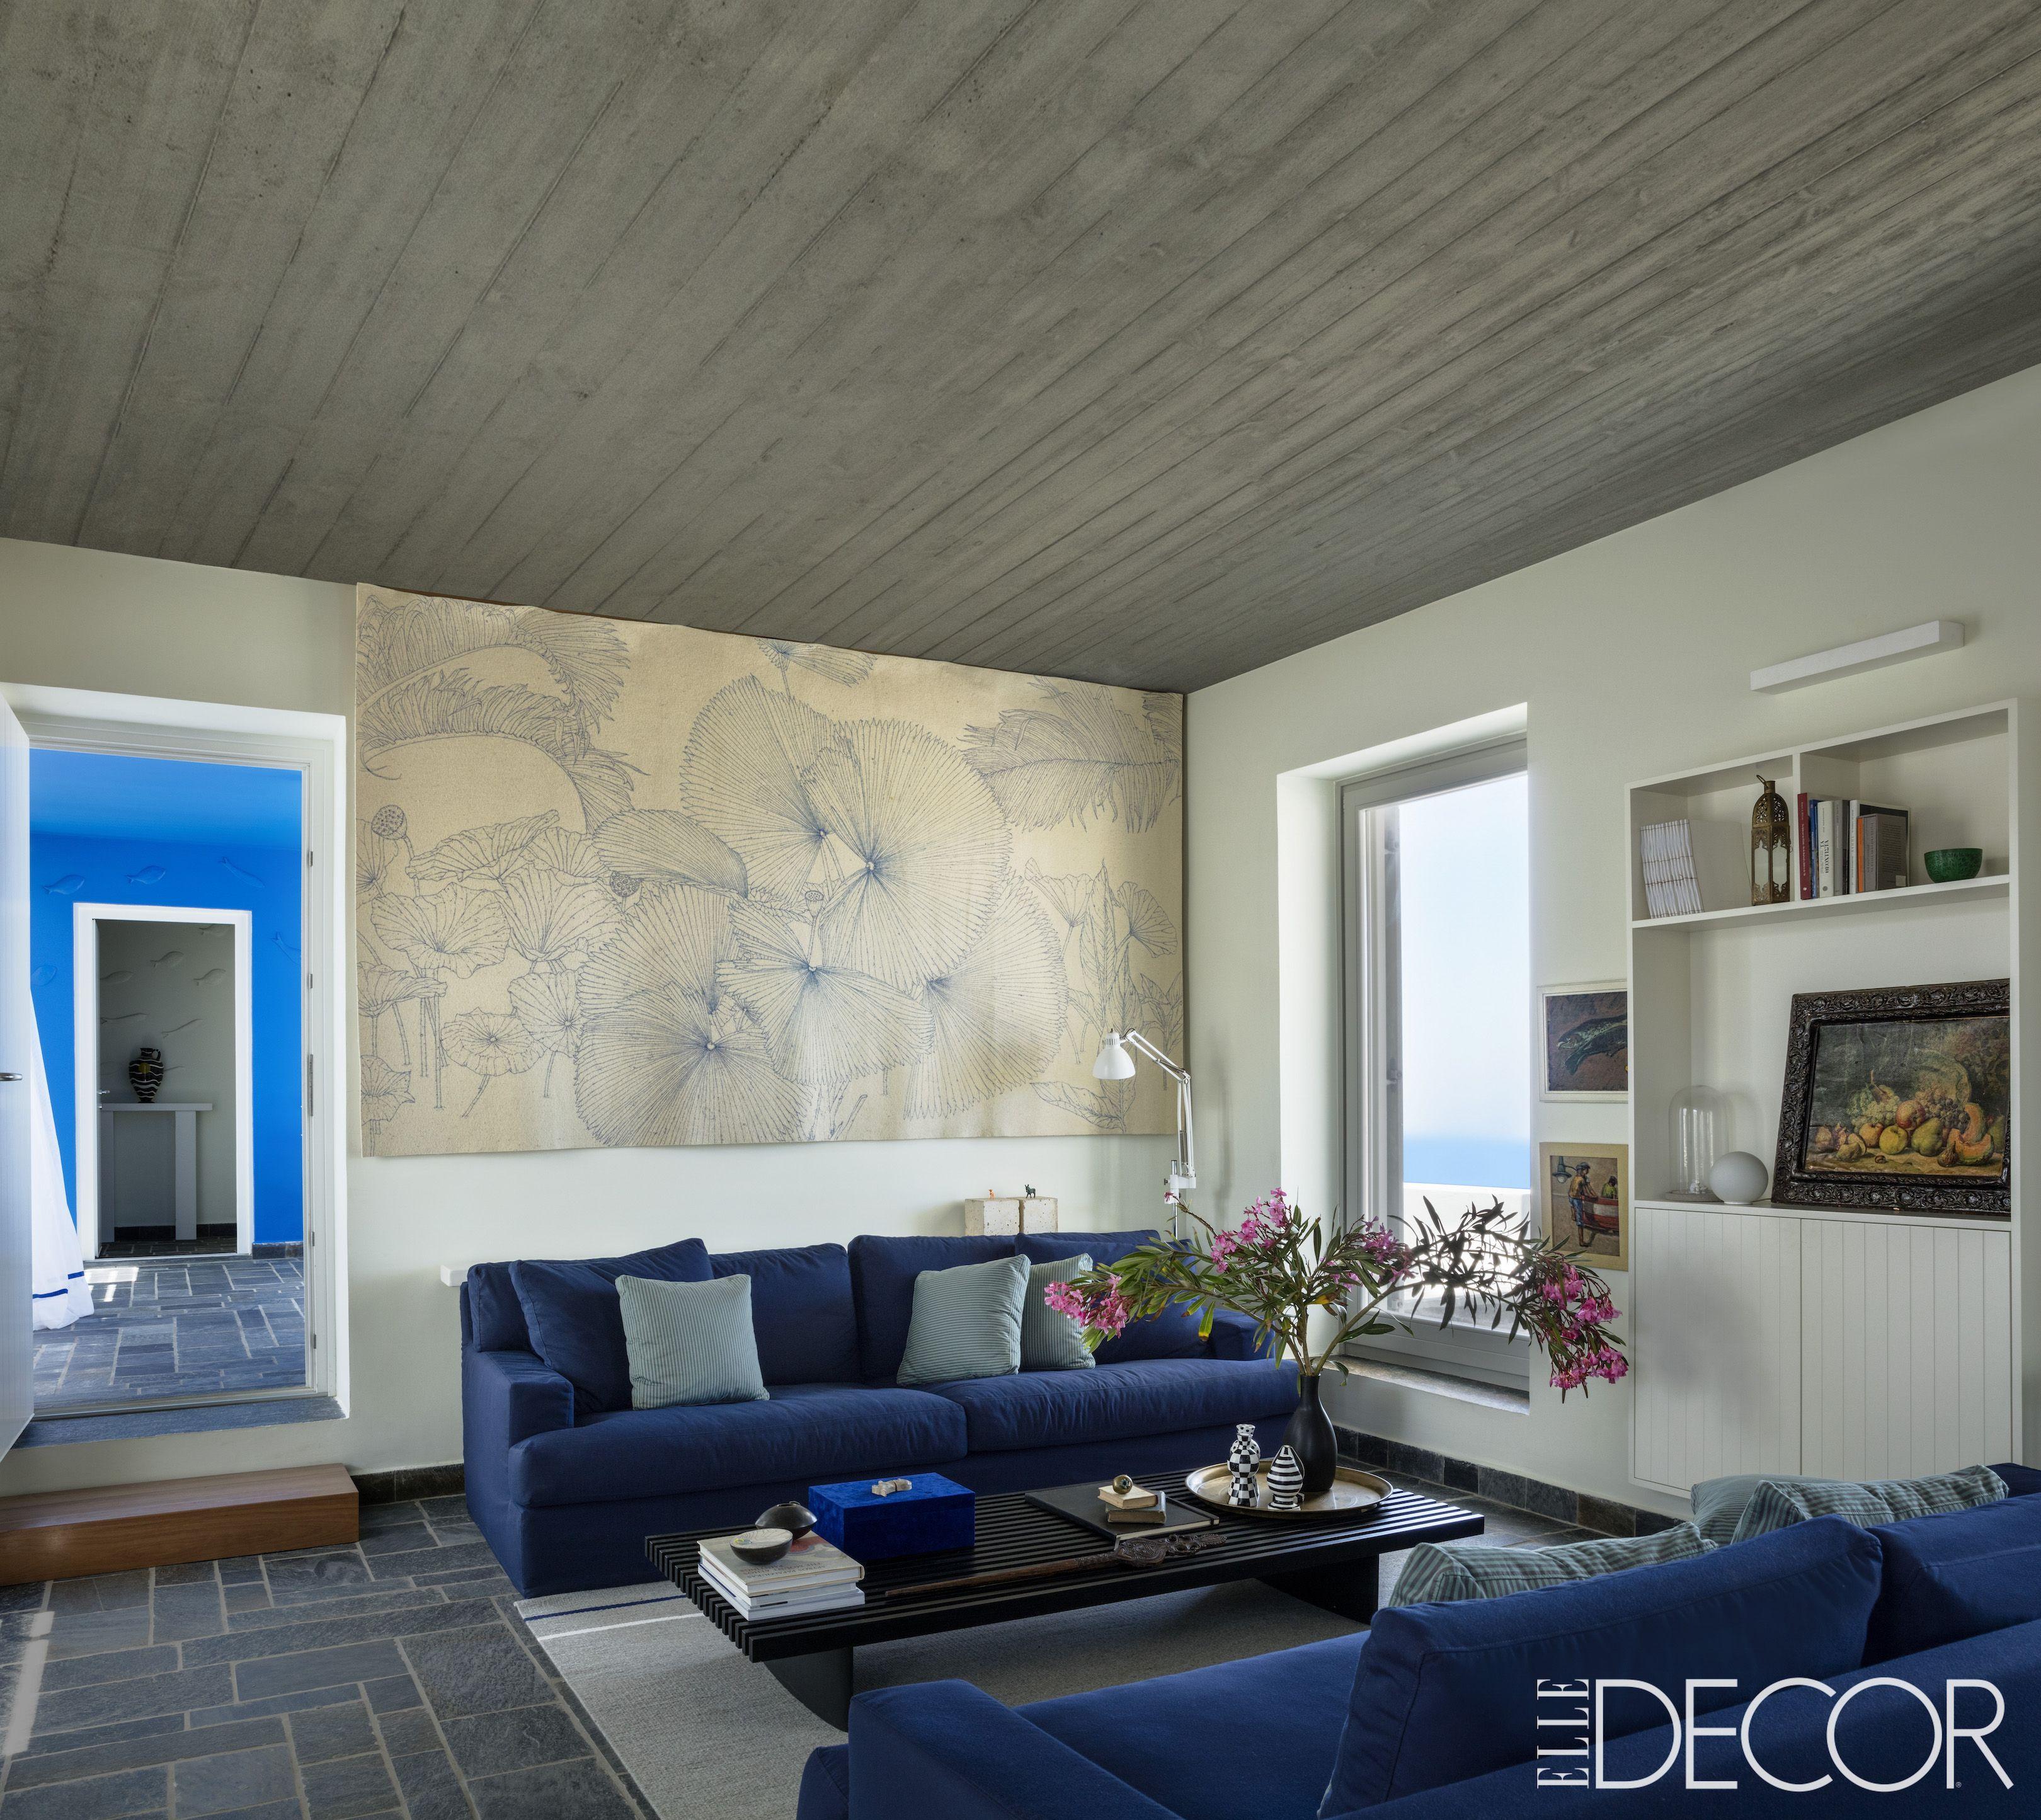 Best Living Room Ideas - Beautiful Living Room Decor & 45 Best Living Room Ideas - Beautiful Living Room Decor